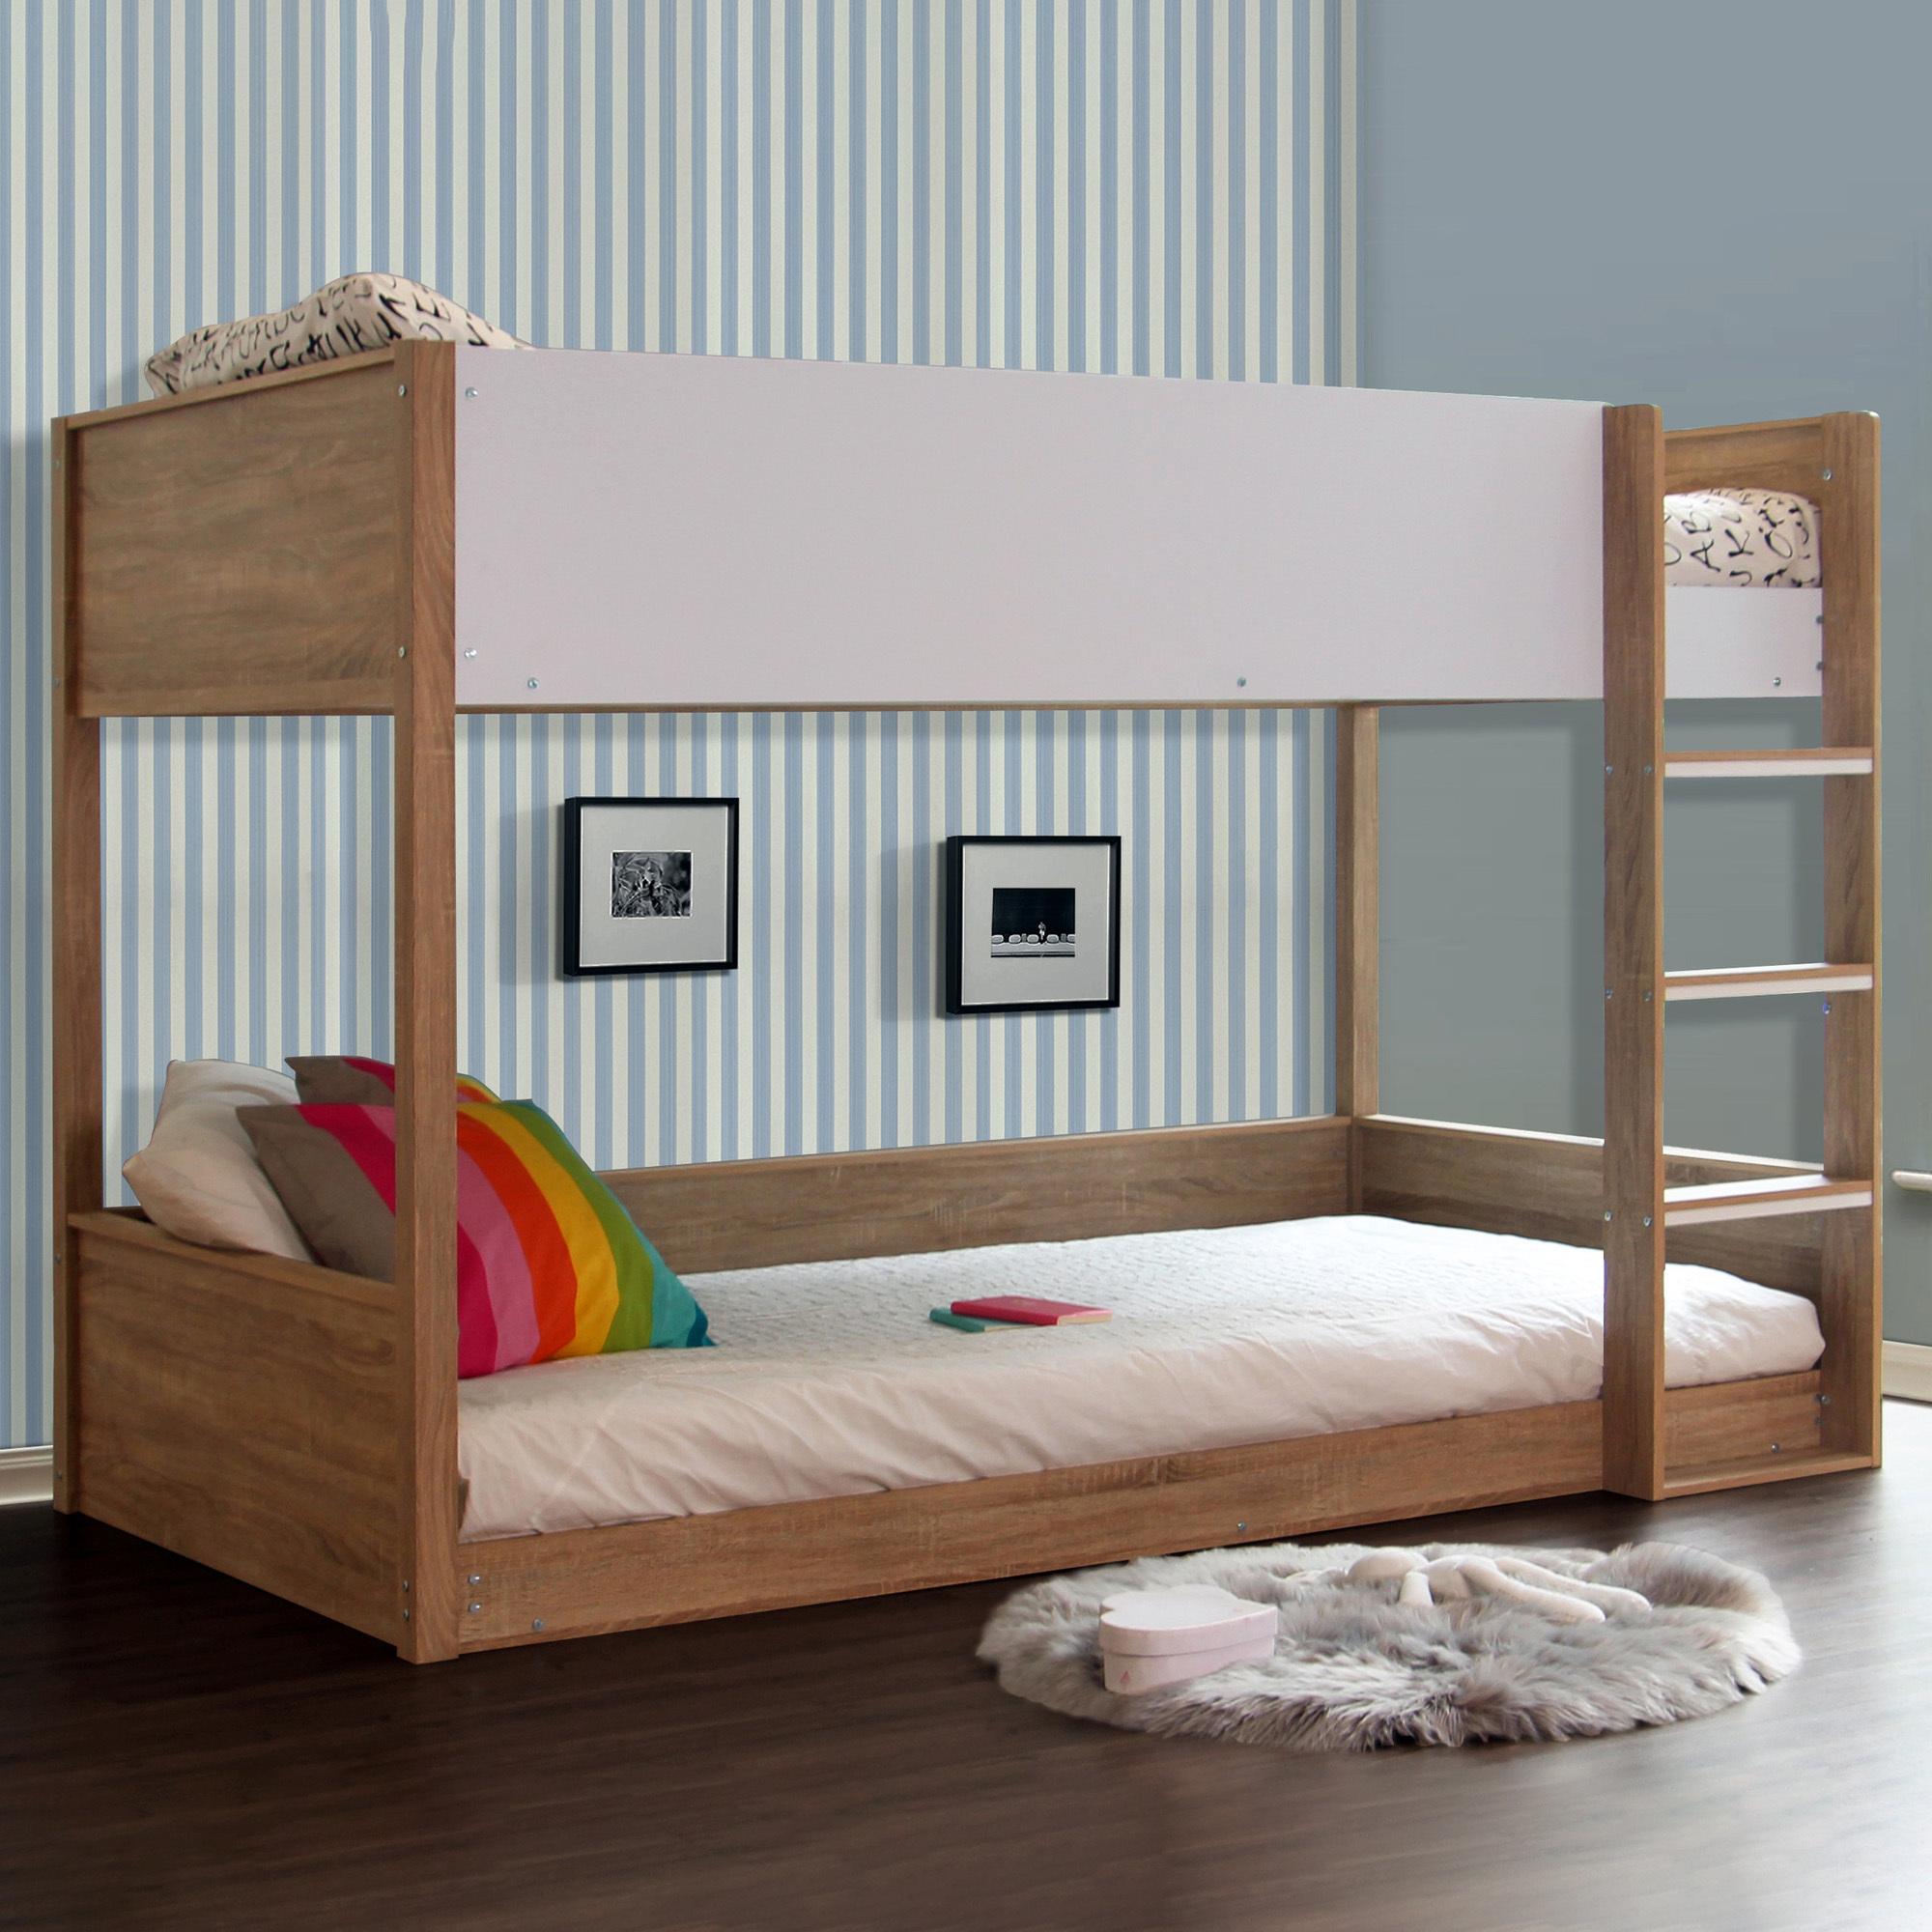 Picture of: Vic Furniture Sonoma Oak Gisborne King Single Bunk Bed Reviews Temple Webster